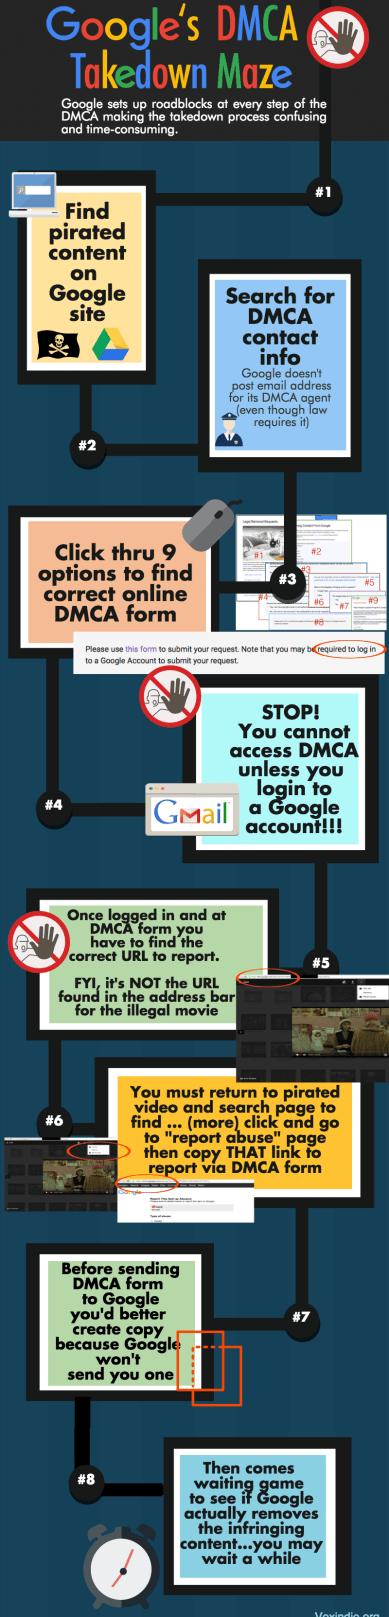 Google DMCA Takedown Maze